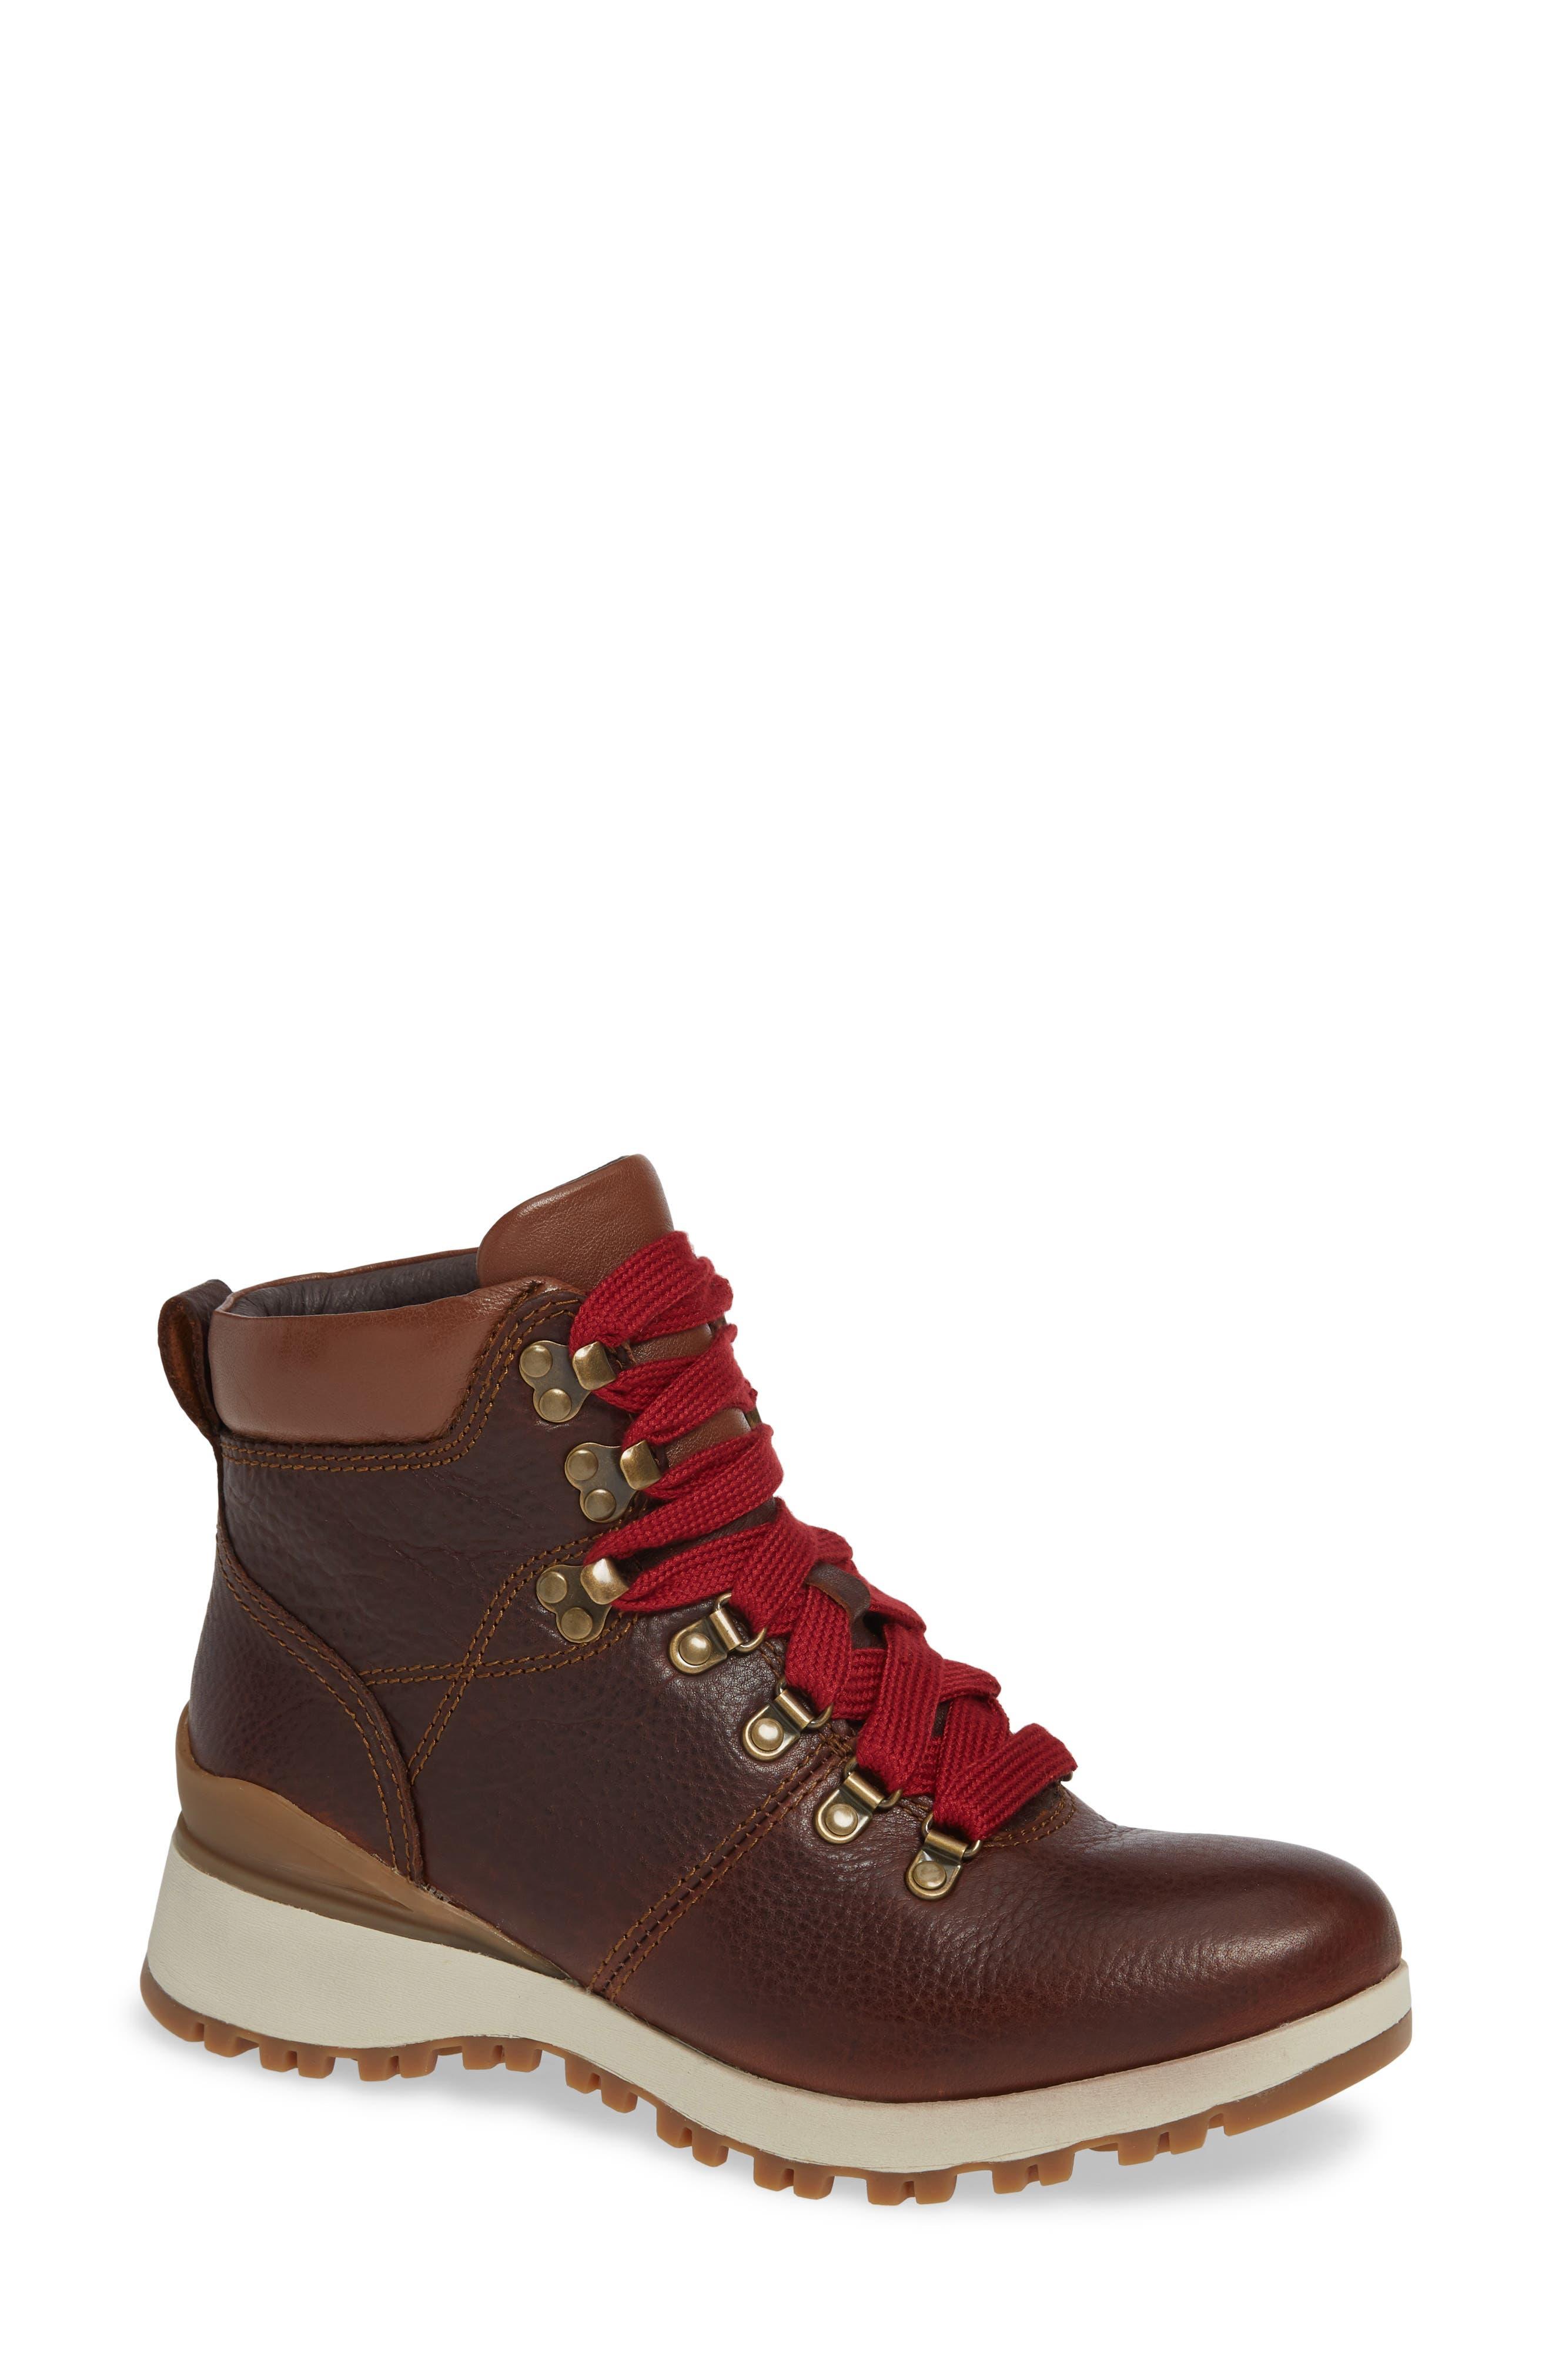 Bionica Dalton Lace-Up Waterproof Boot- Brown